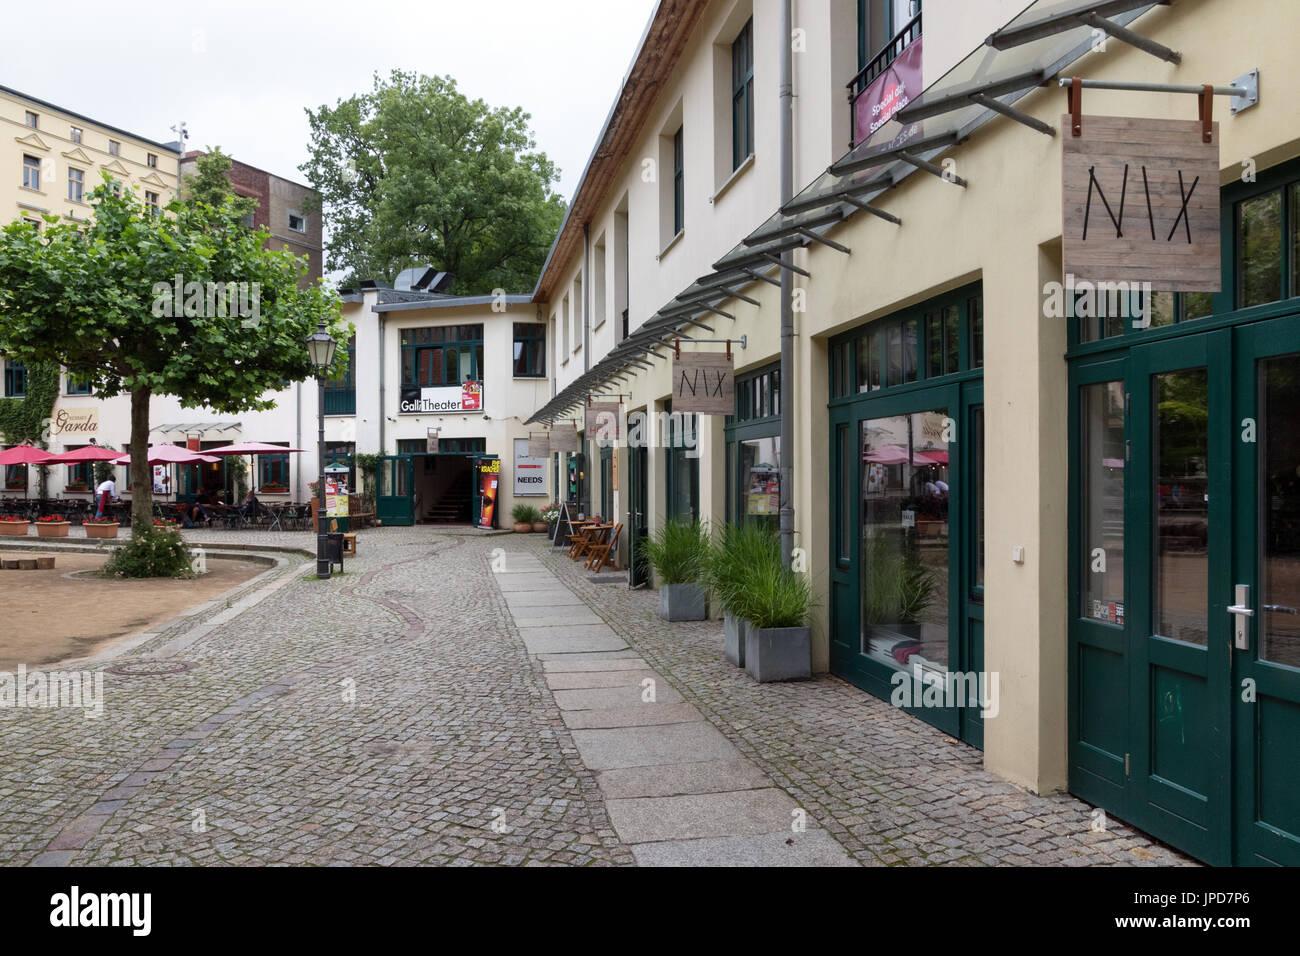 One of Berlin's Courtyards in the Hackesche Hofe district - Stock Image